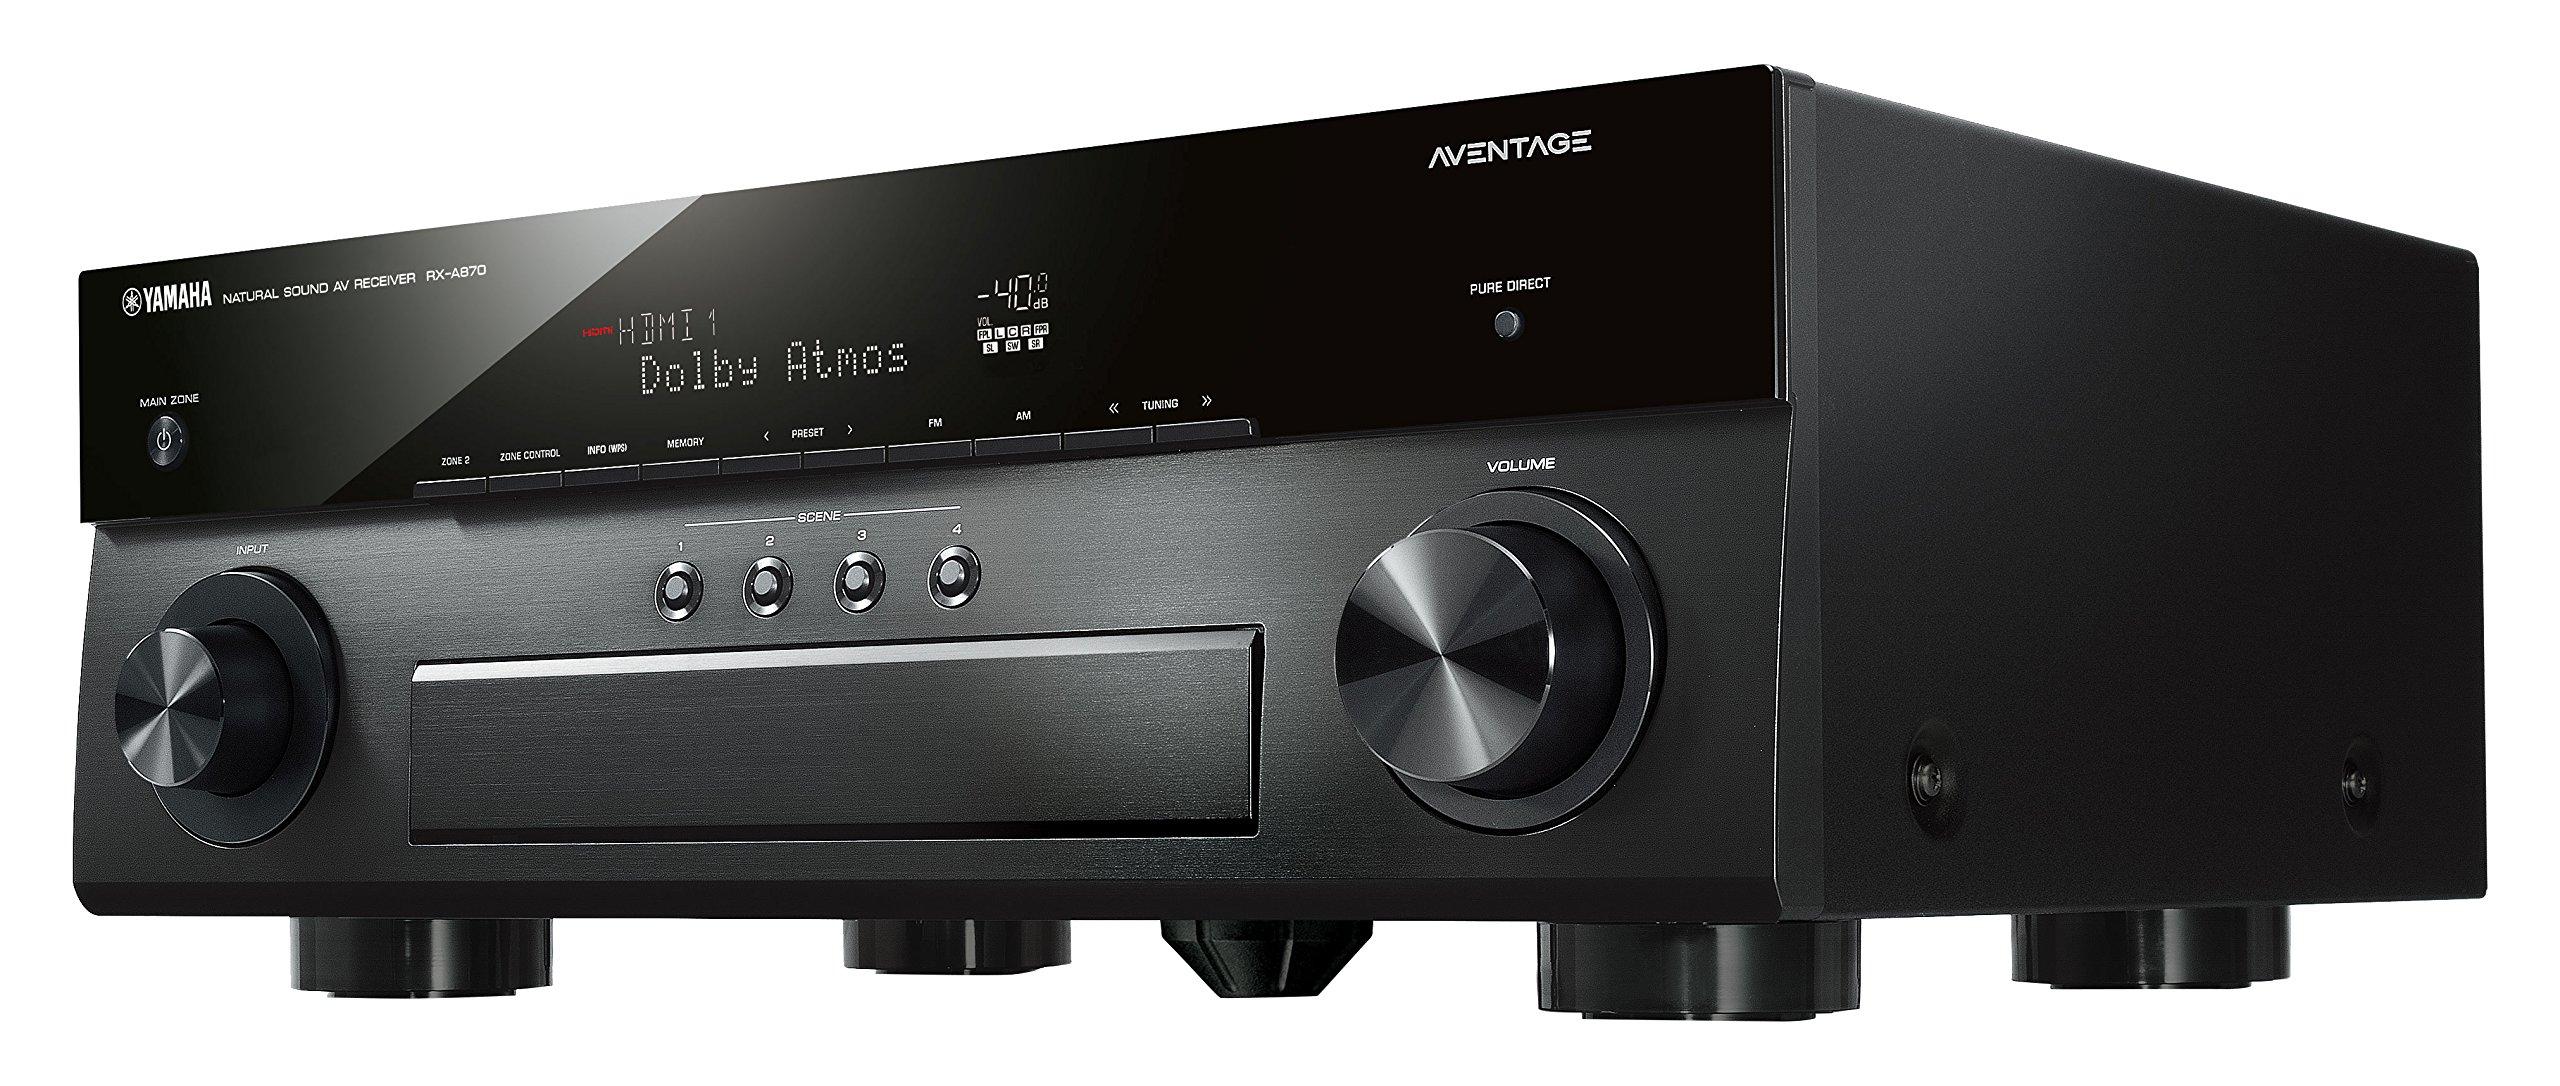 Yamaha AVENTAGE Audio & Video Component Receiver,Black (RX-A870BL)